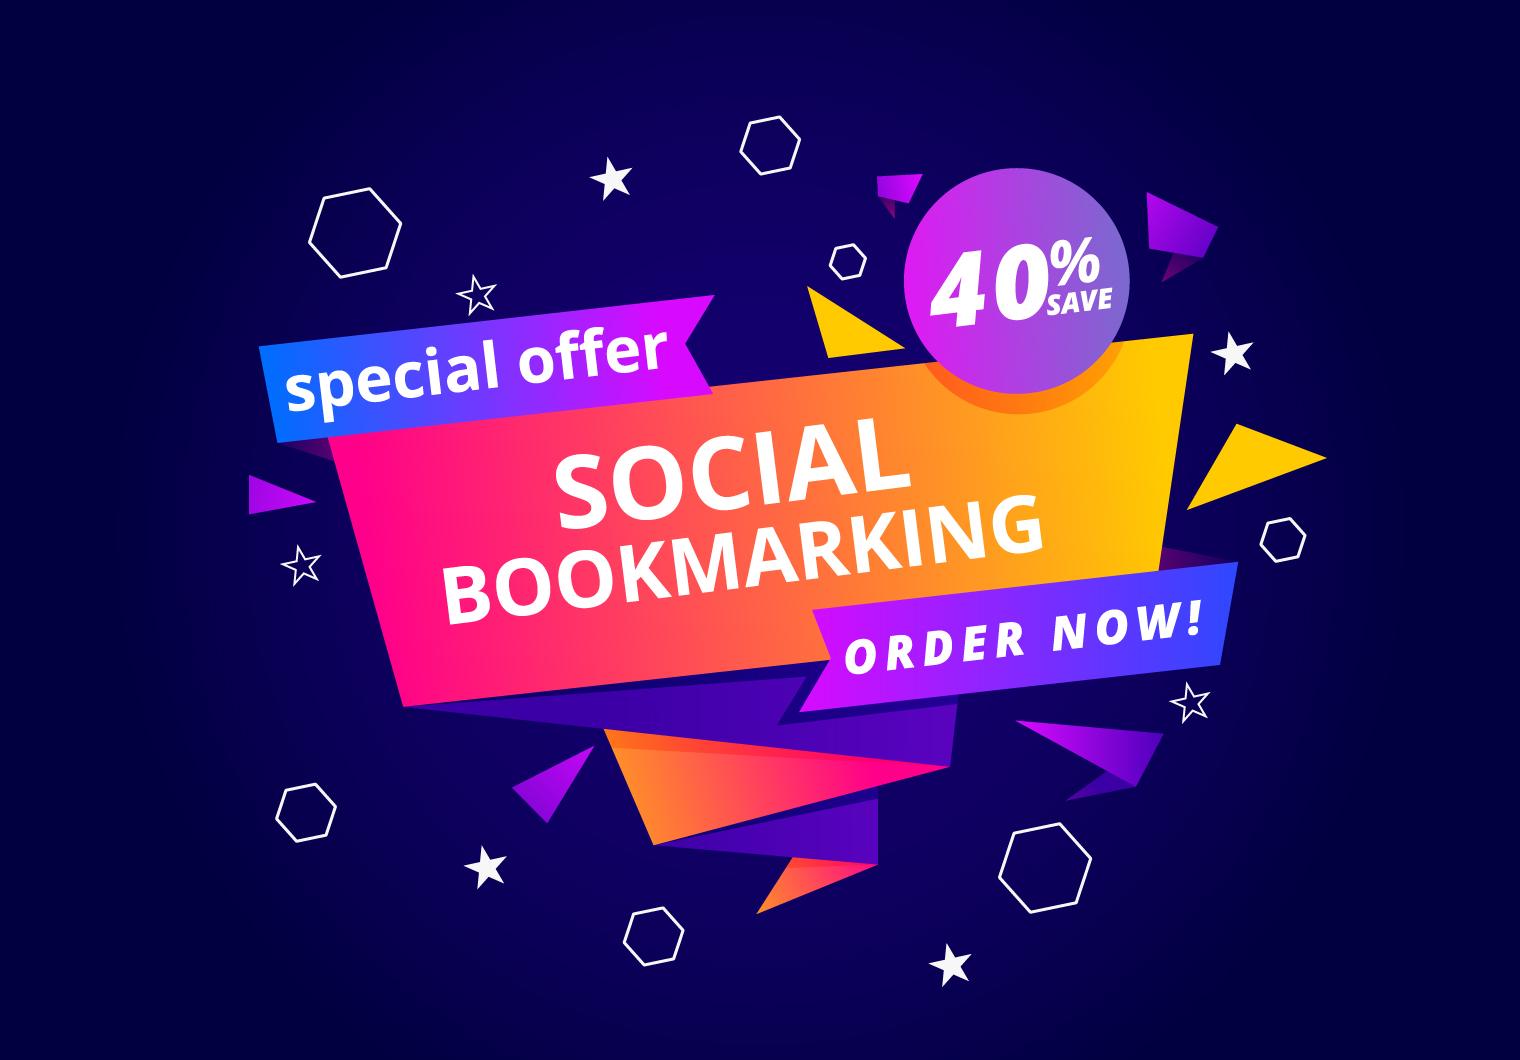 I Will Create Manually 50 High PR Social Bookmarking SEO Backlinks